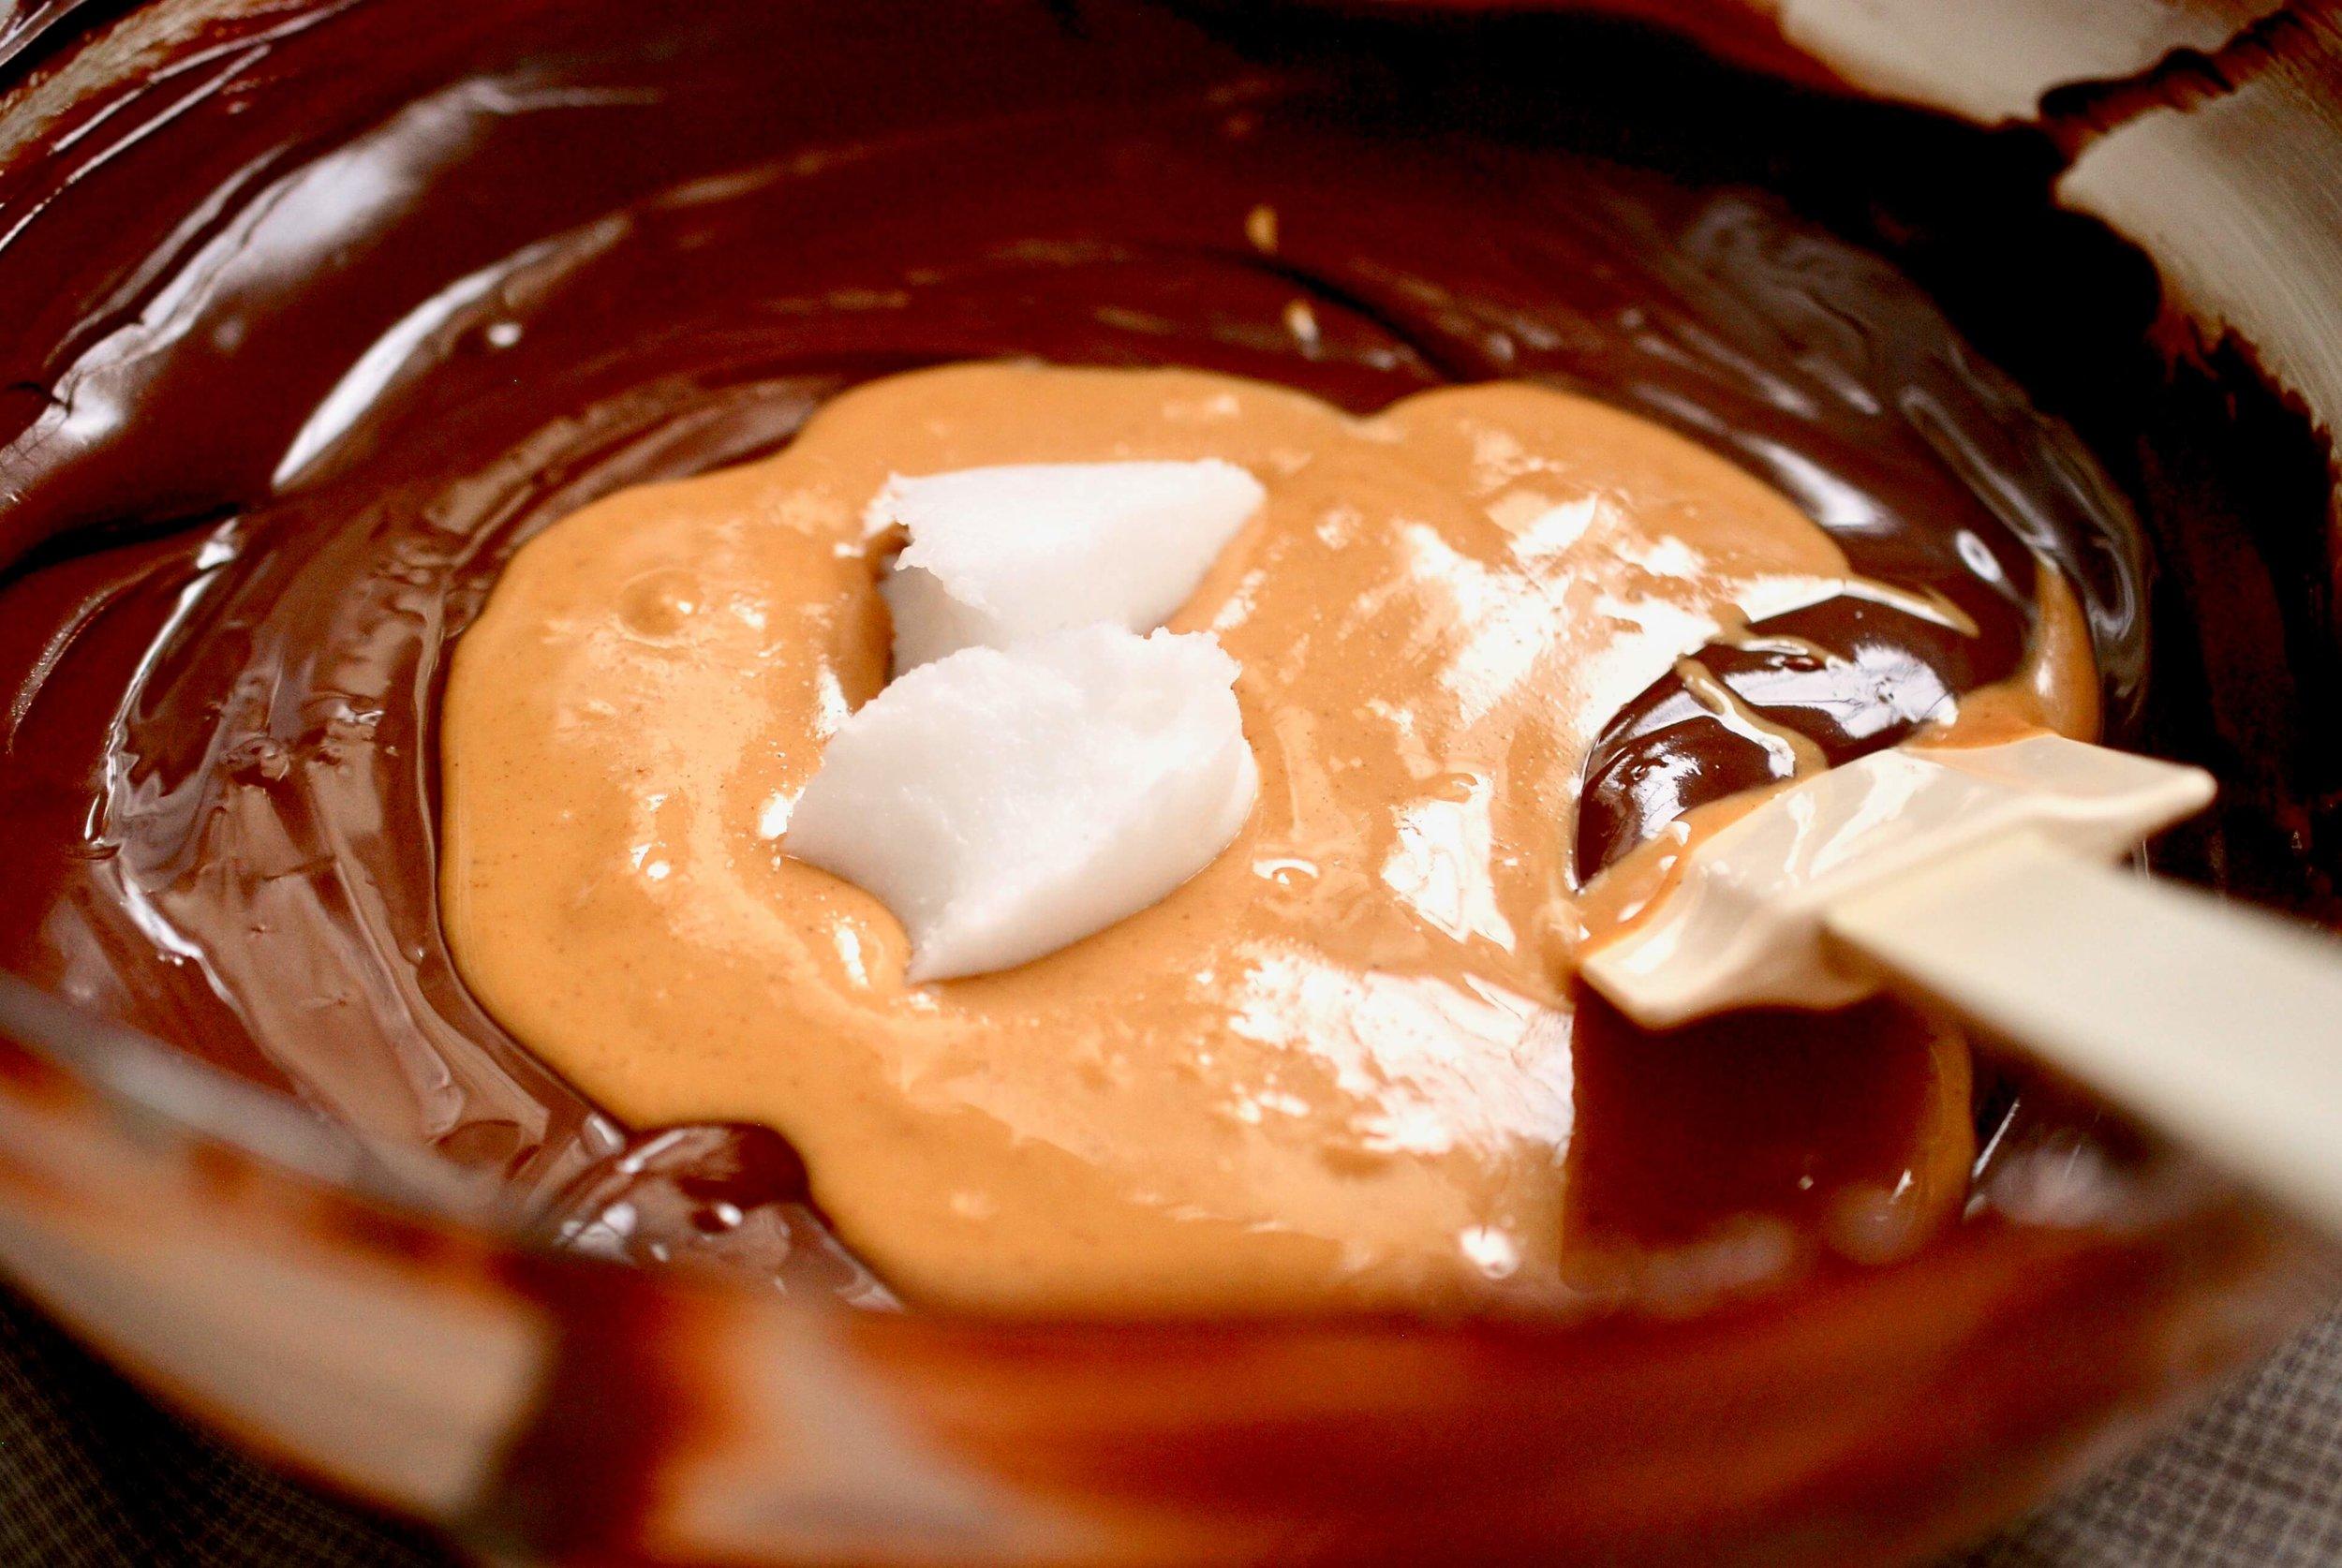 peanut cluster_melted chocolate.jpeg